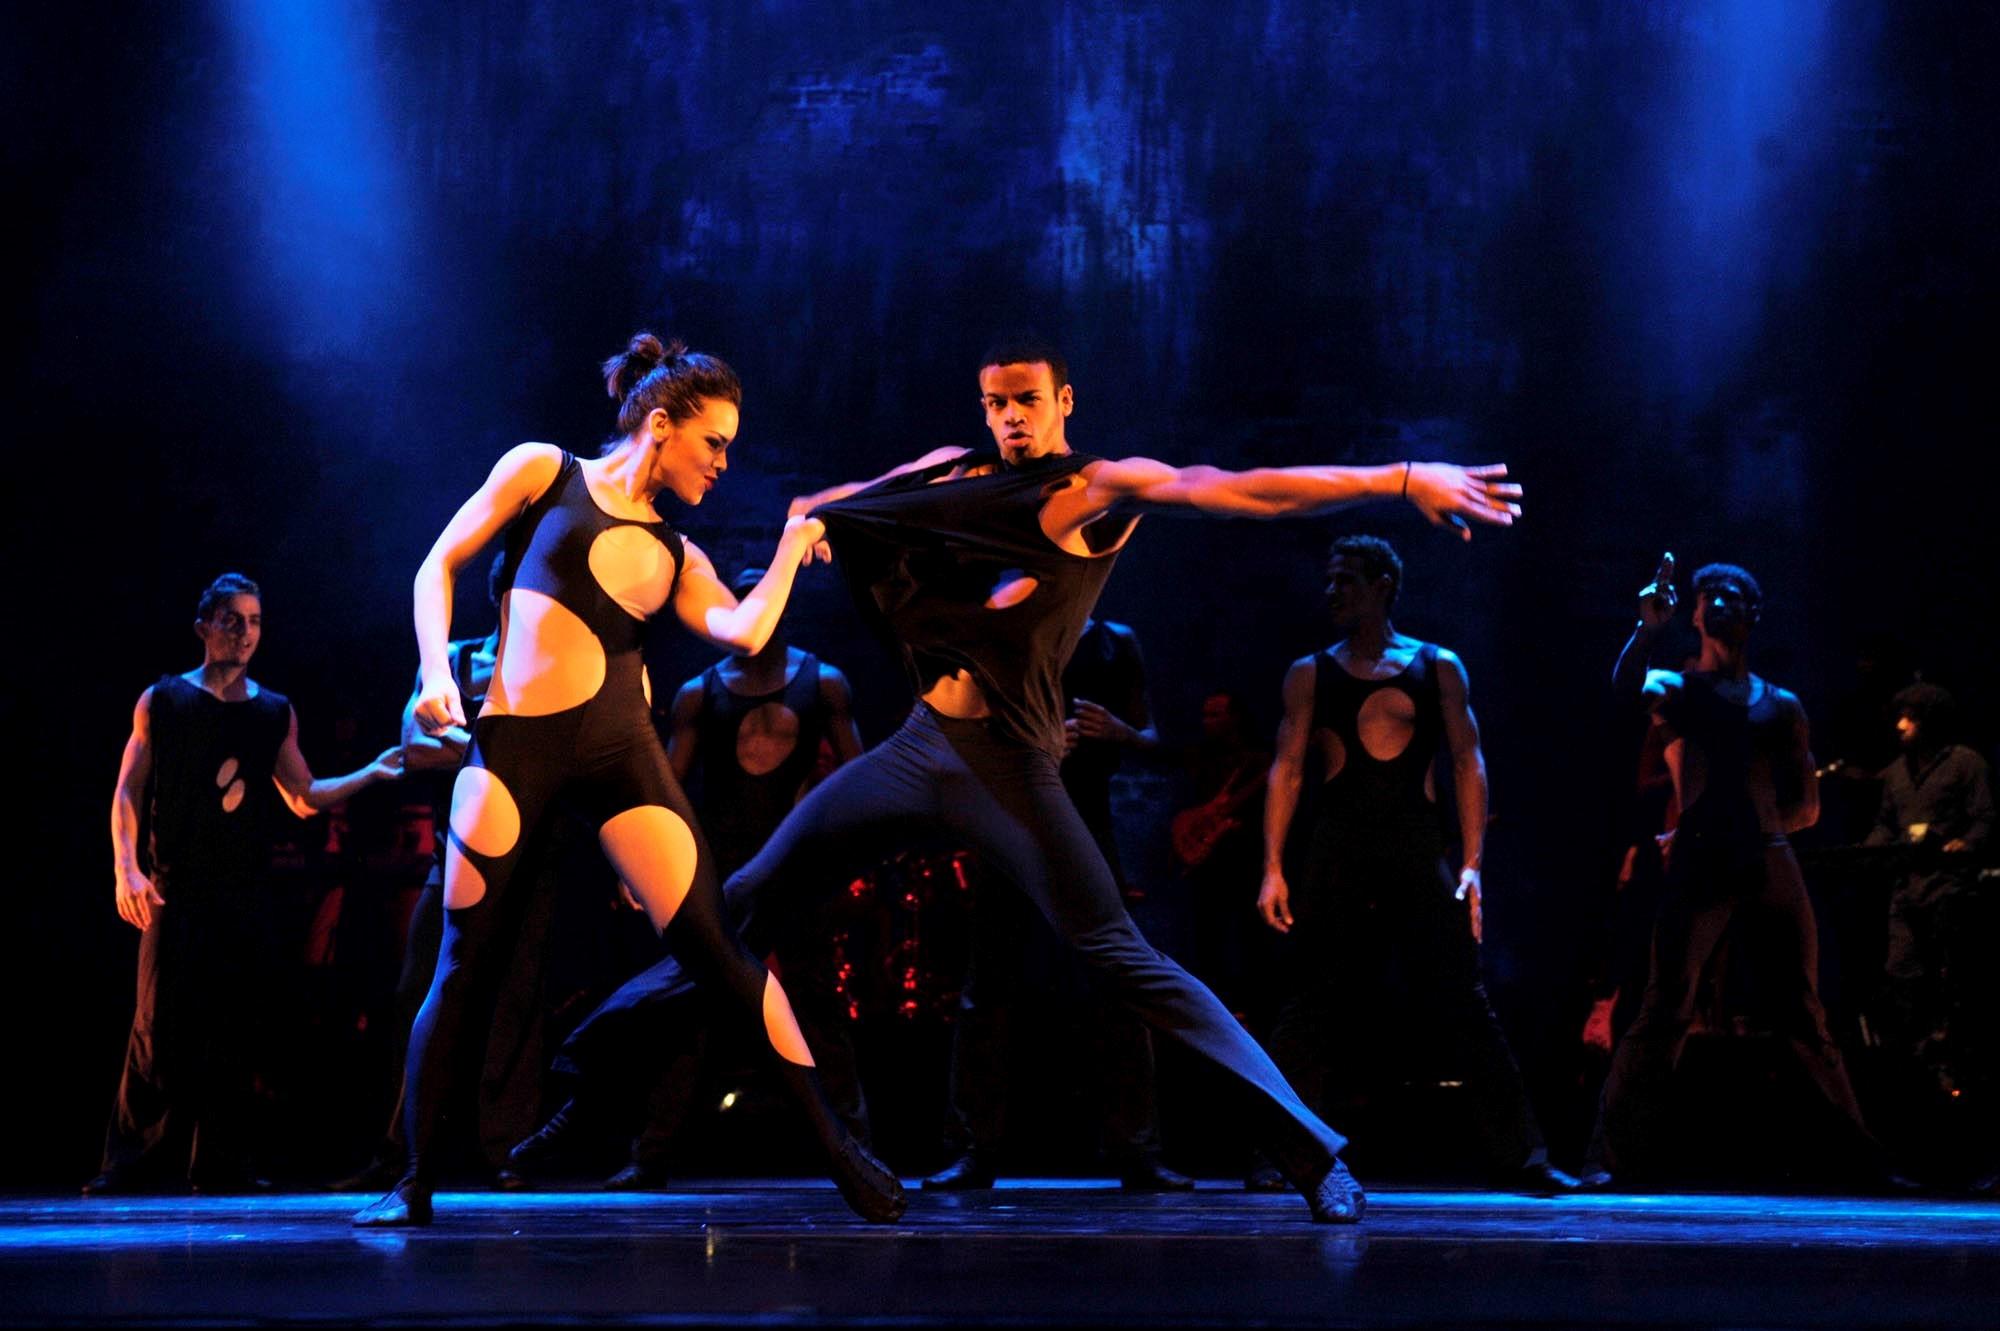 Alejandro Perez Fernandez Ballet Revolucion 2